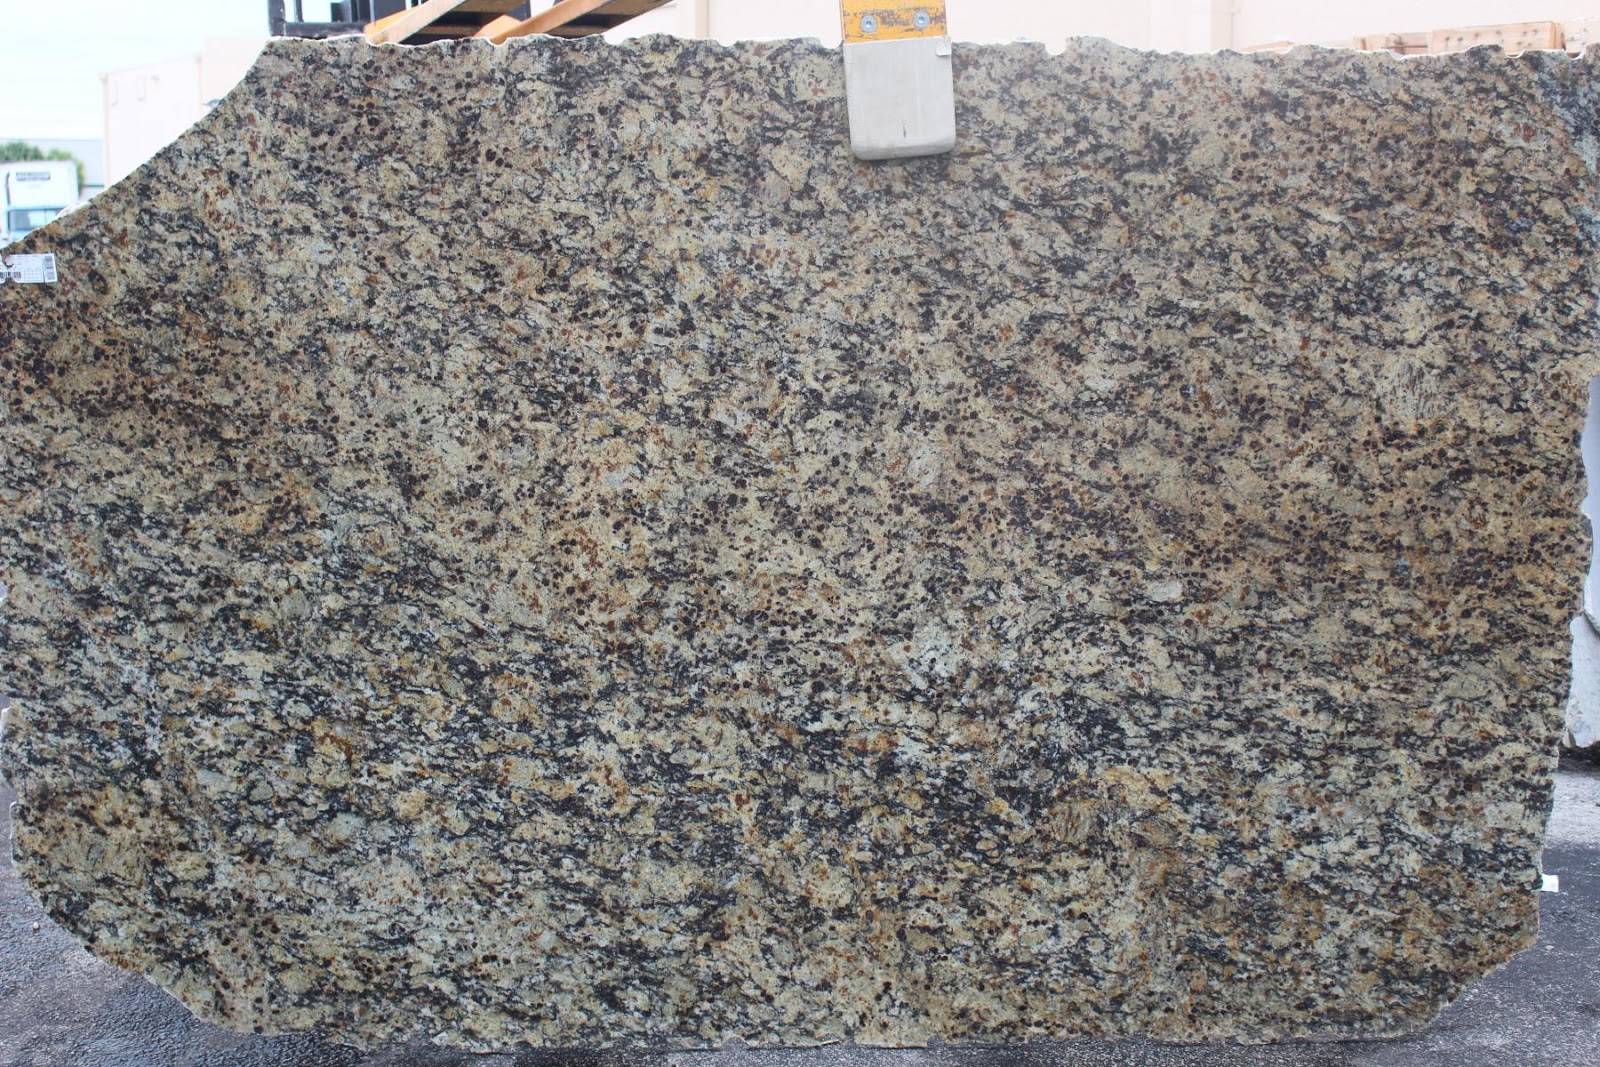 Top Quality Granite Slabs In Fort Lauderdale At STSTONES